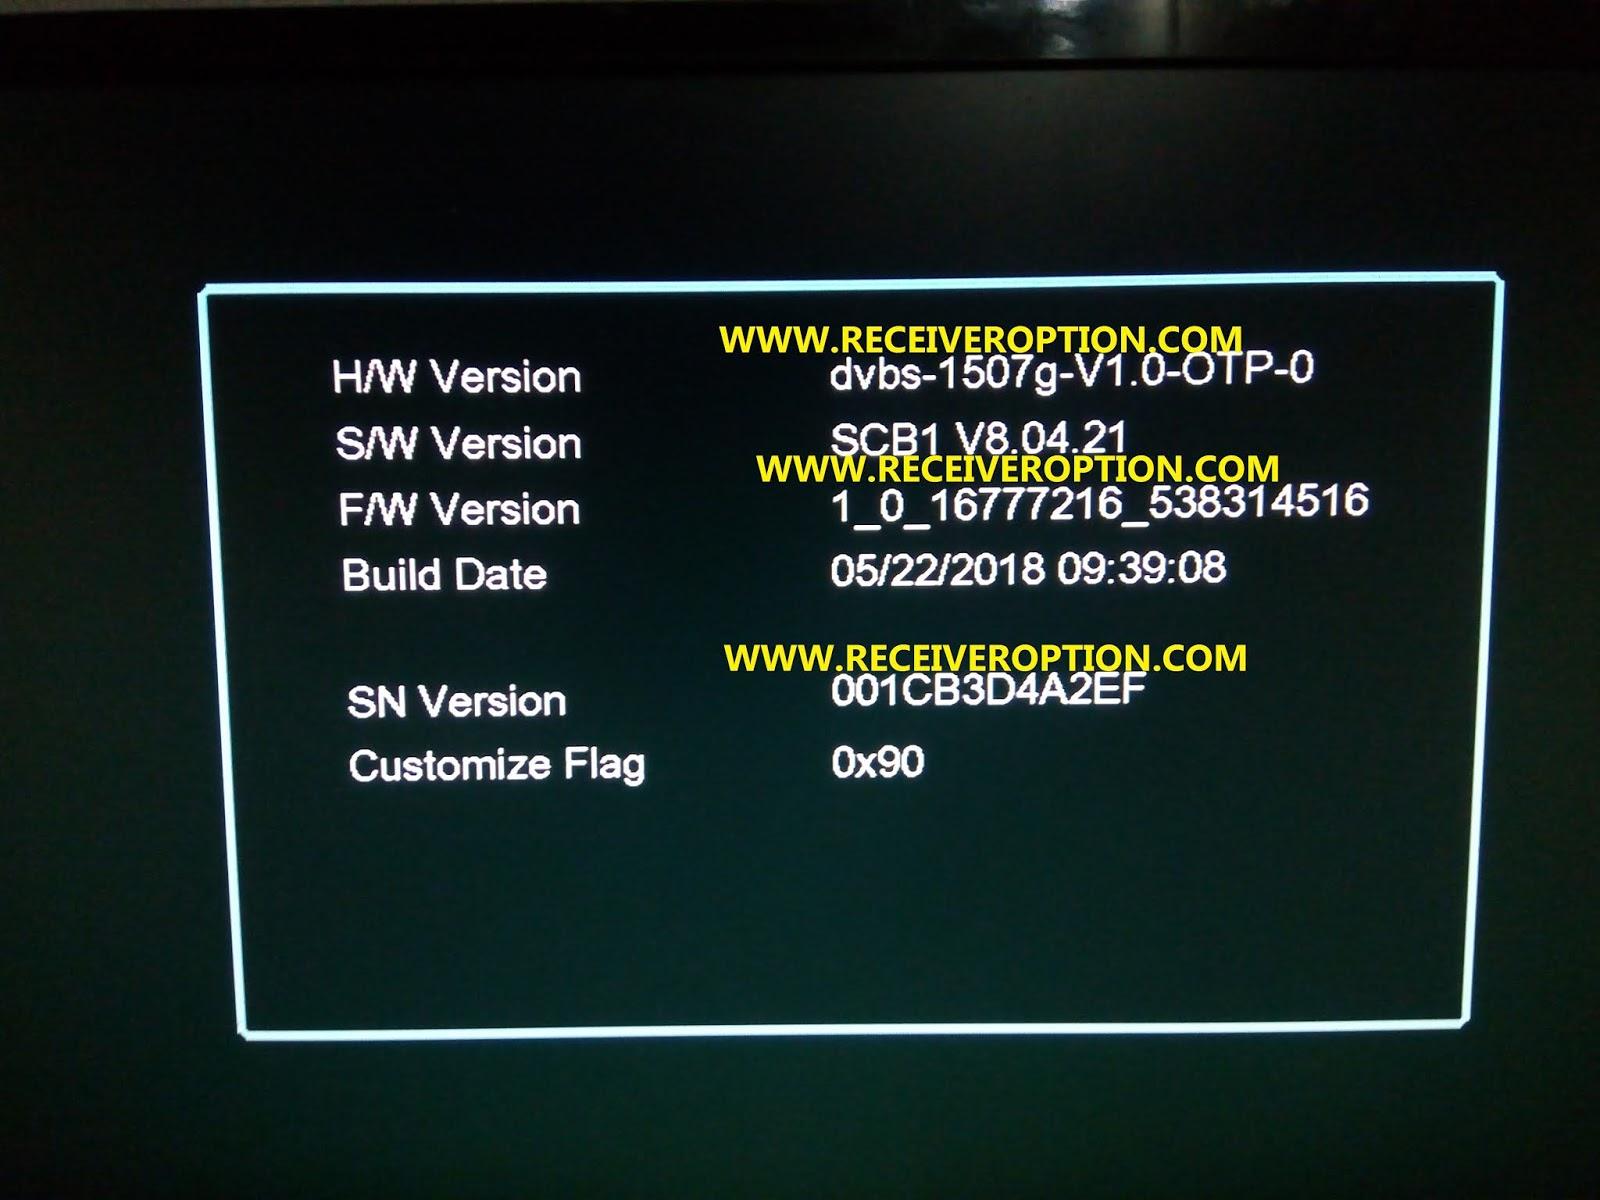 All Multi Media Convert 1506g T0 1507g With New Powervu Key Ok